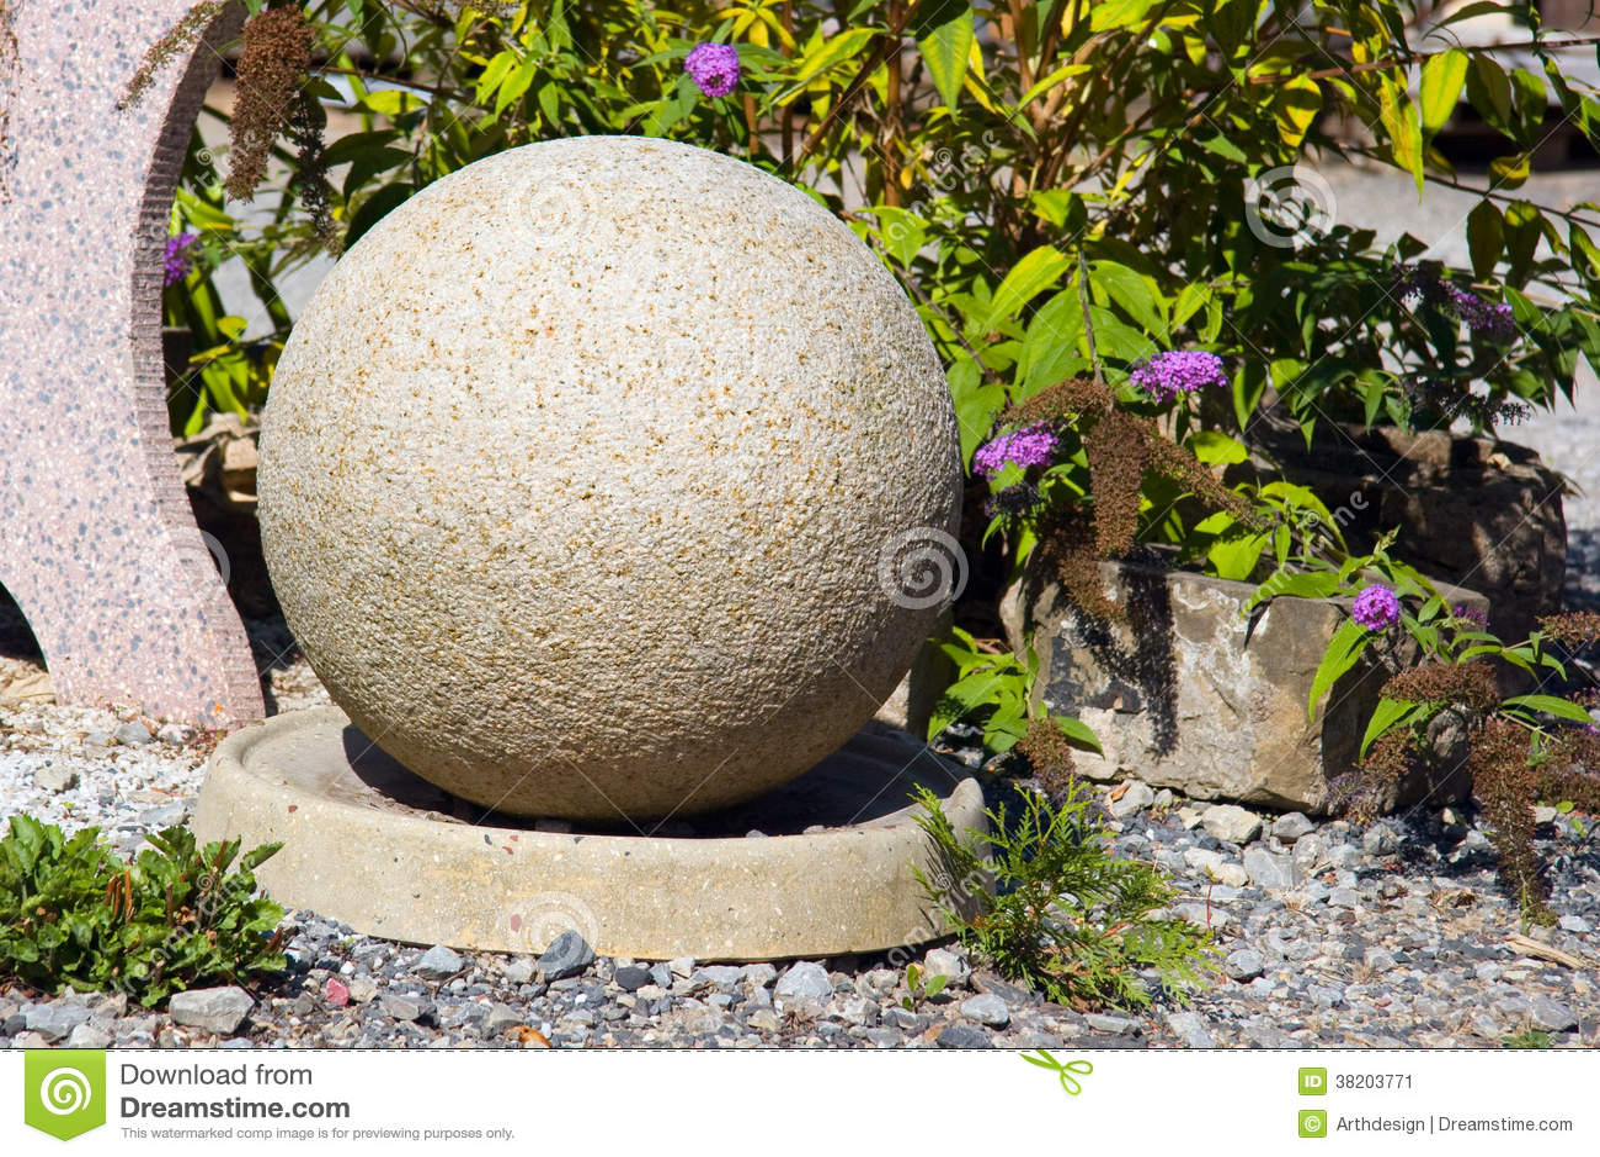 boule en pierre dans le jardin image stock image 38203771. Black Bedroom Furniture Sets. Home Design Ideas